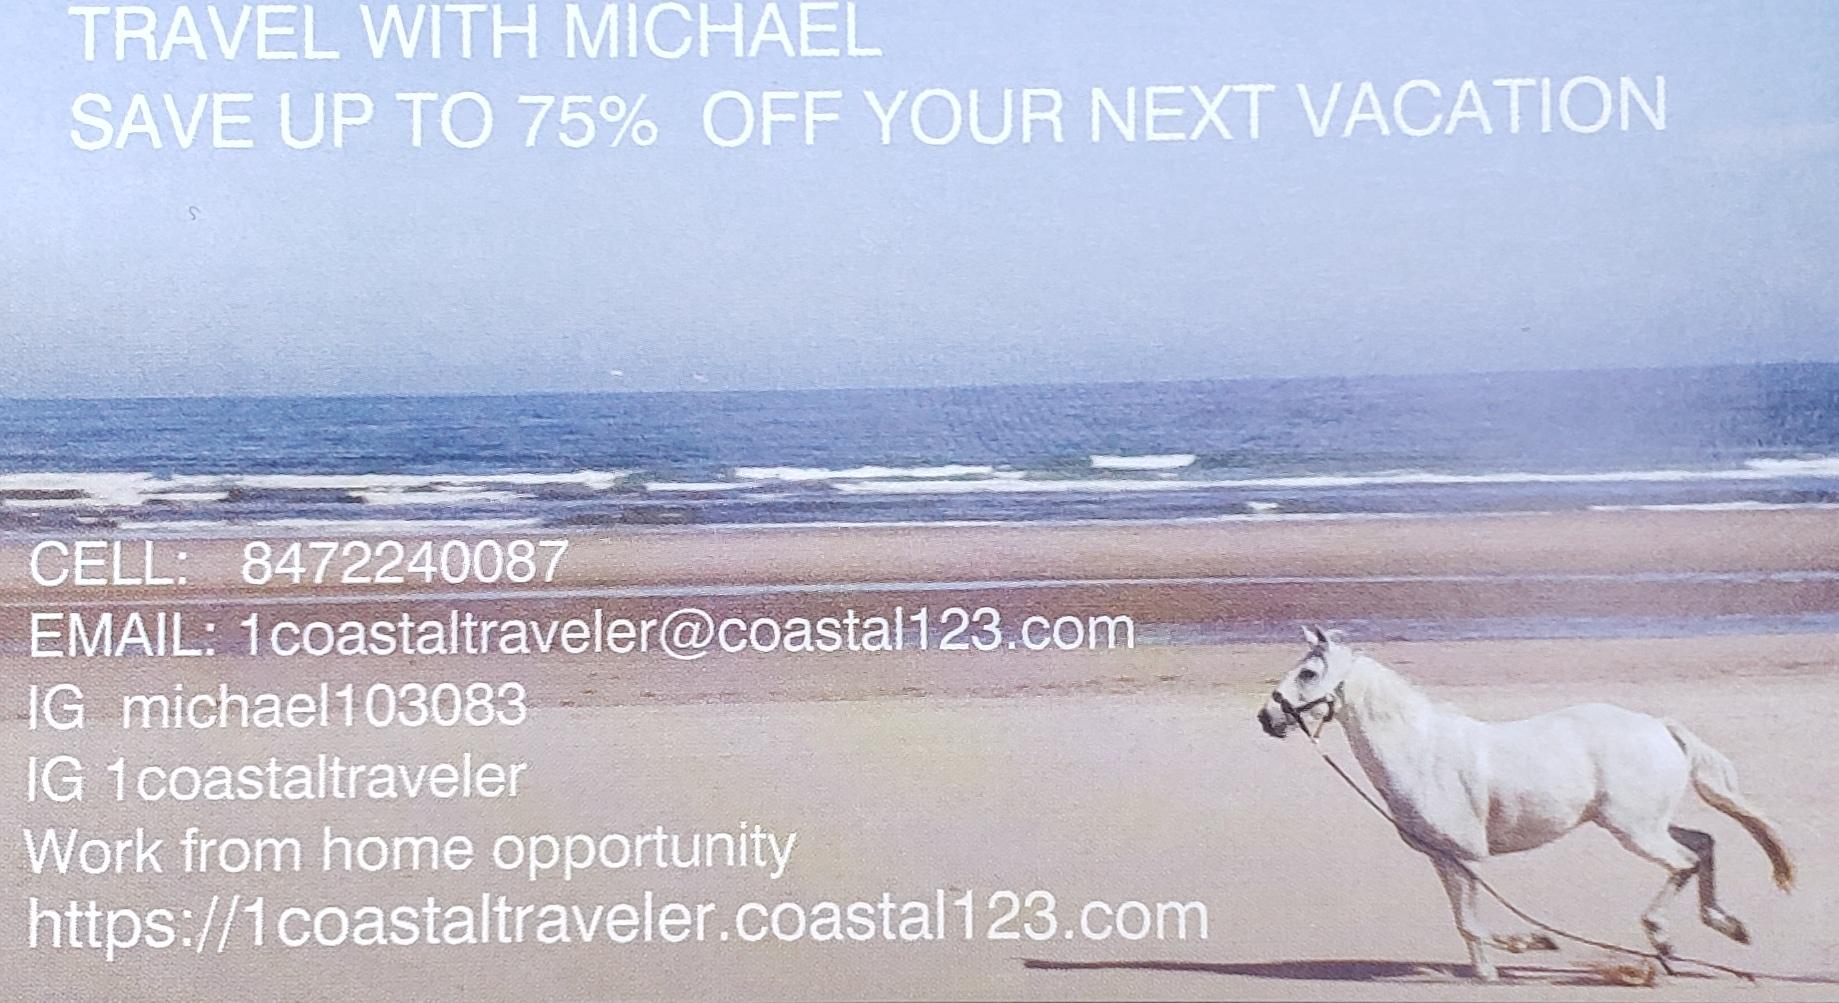 Coastal Travels